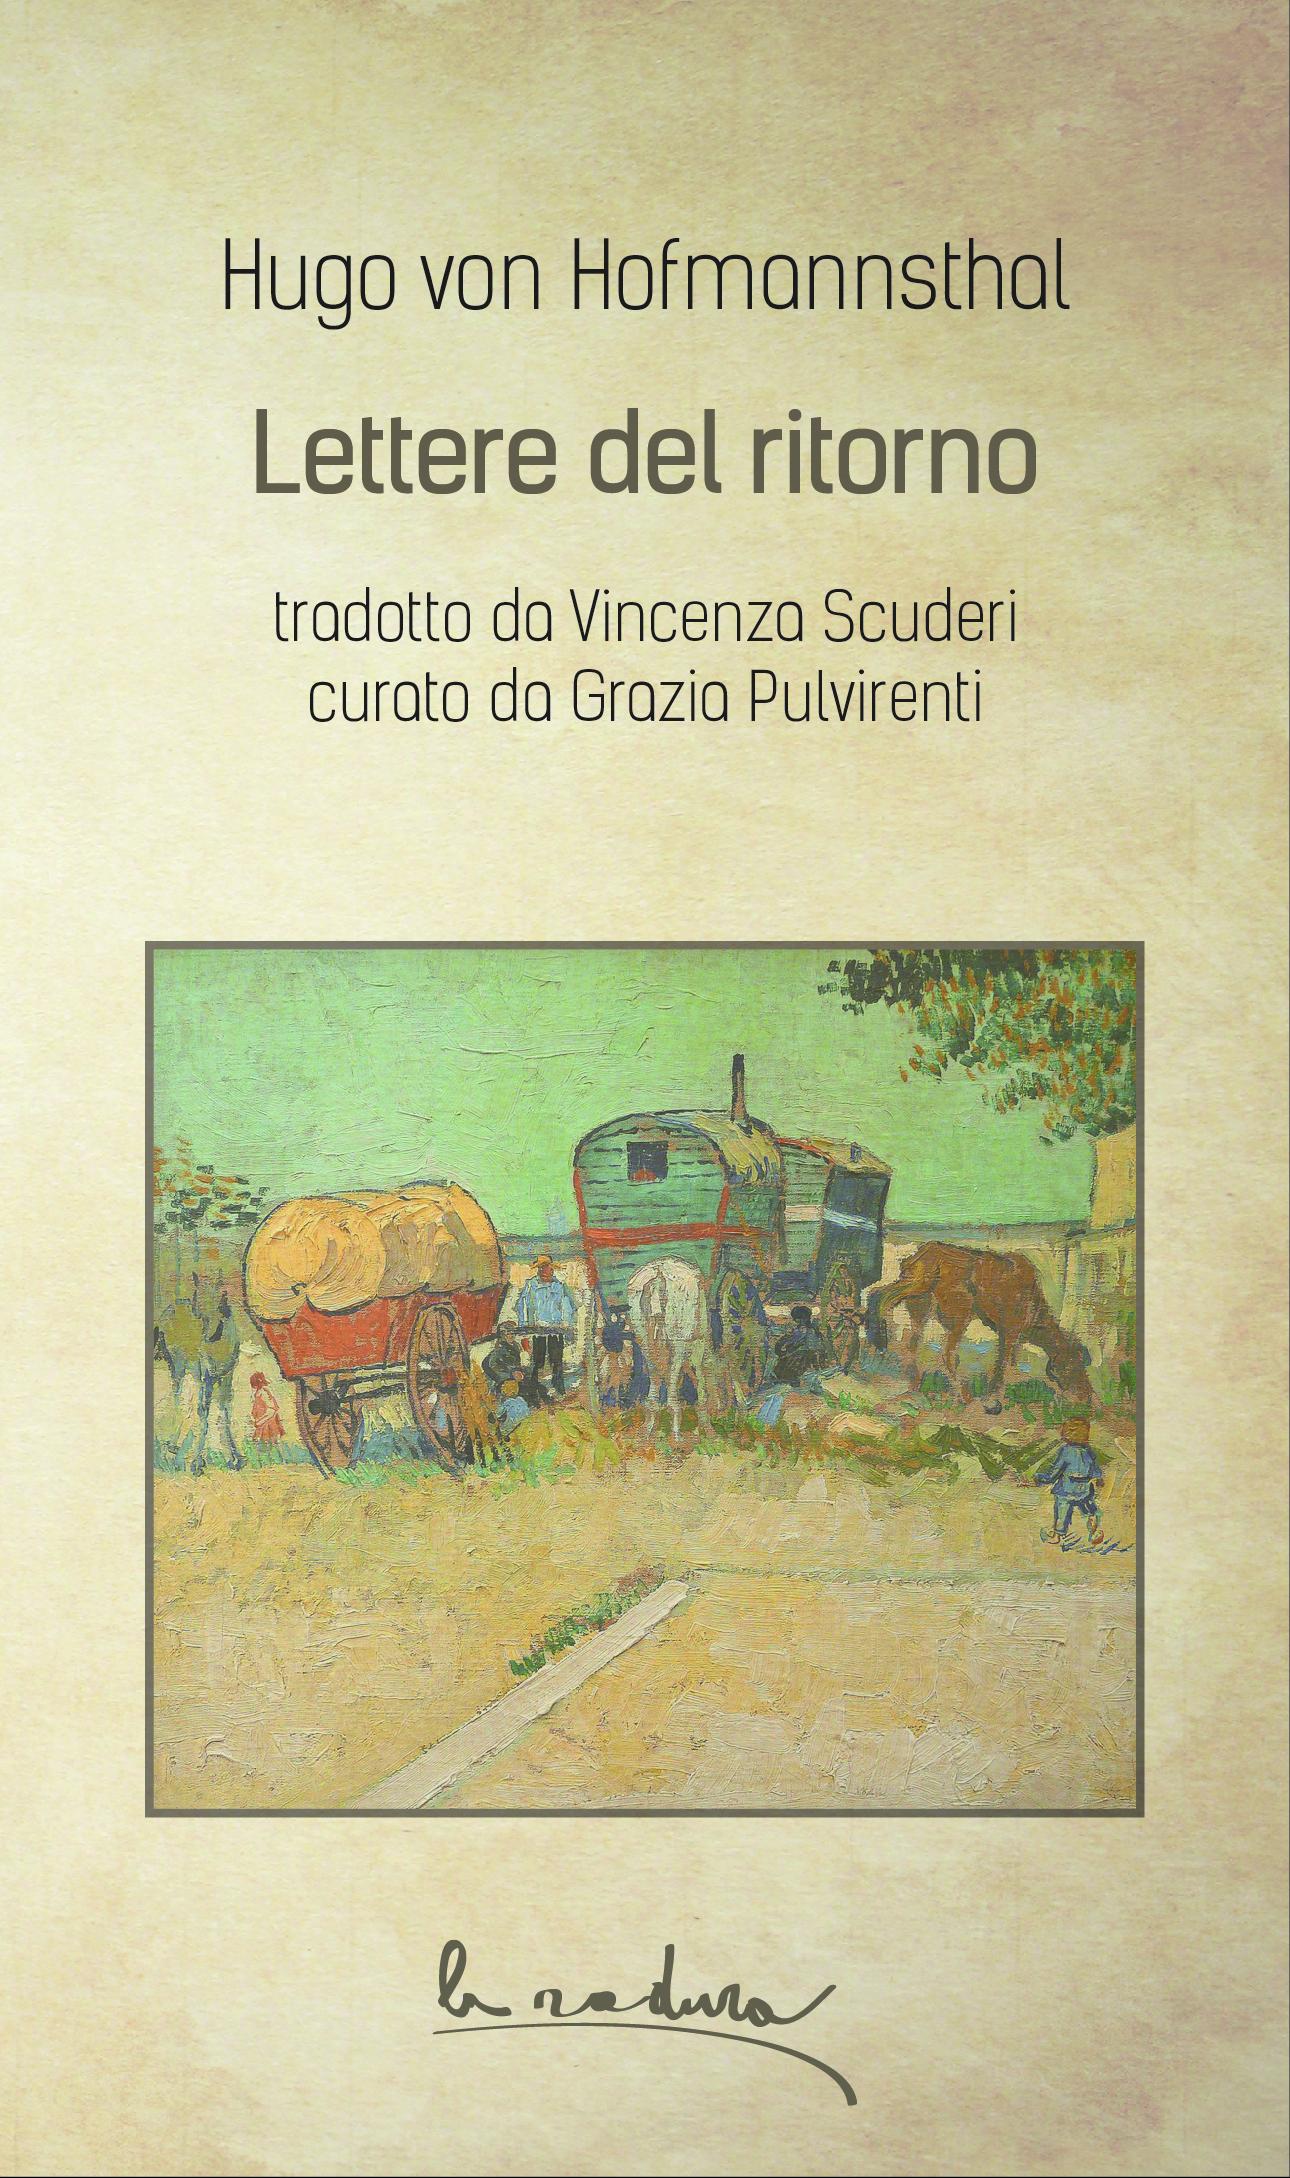 Hugo von Hofmannsthal - Lettere del ritorno 9788898119523